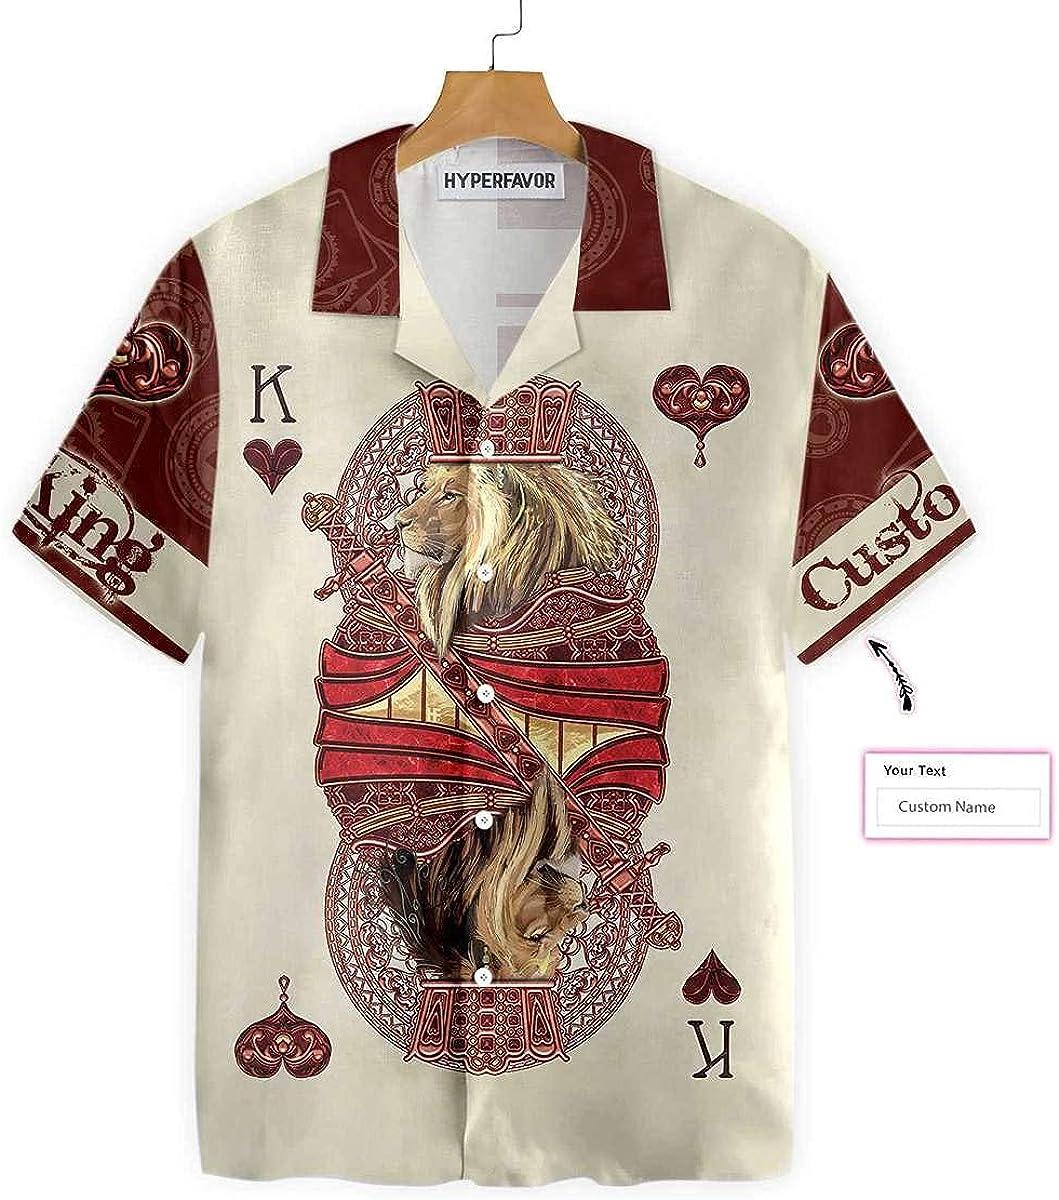 HYPERFAVOR Custom Casino Shirts for Men- Casual Short Sleeve Casino Poker Shirts- Casino Hawaiian Shirt Gift Ideas